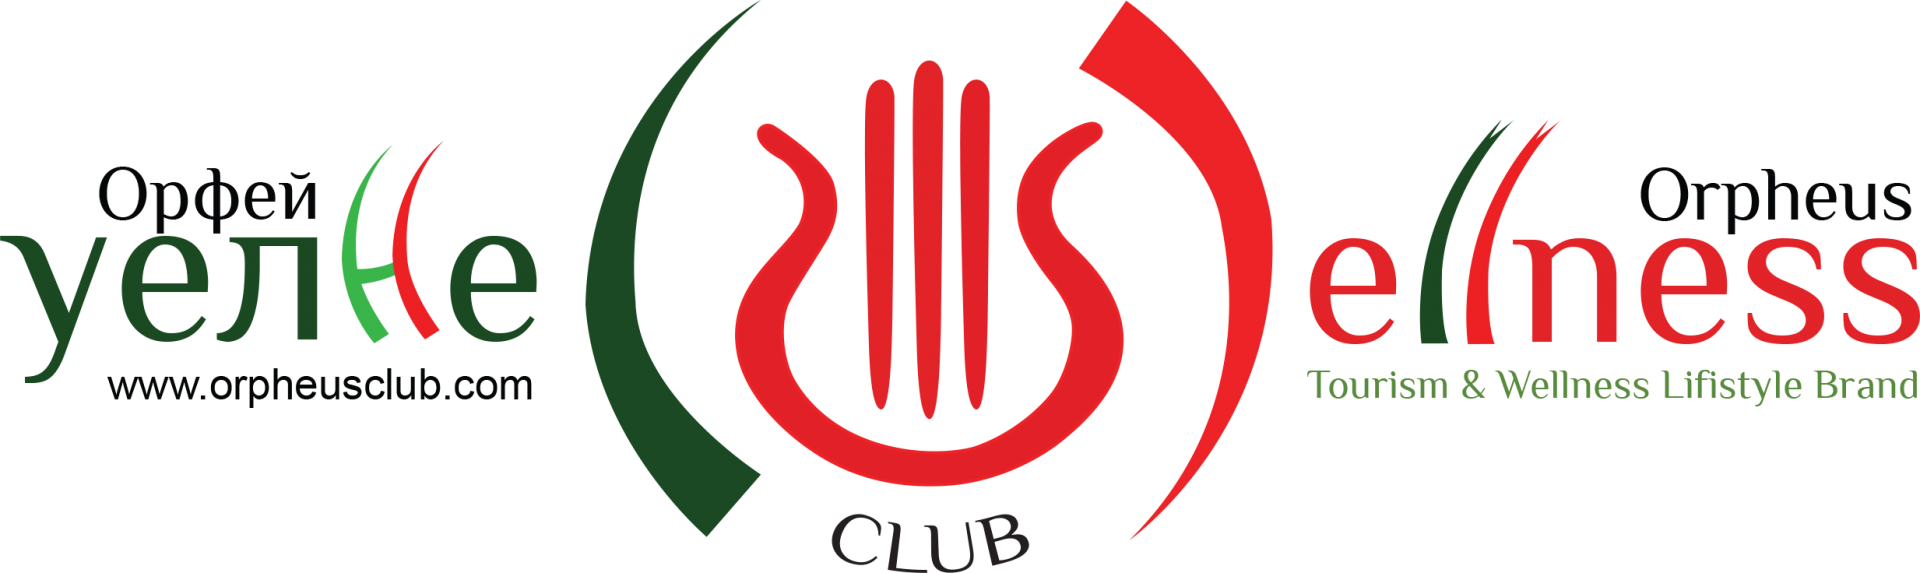 OKU_logo2